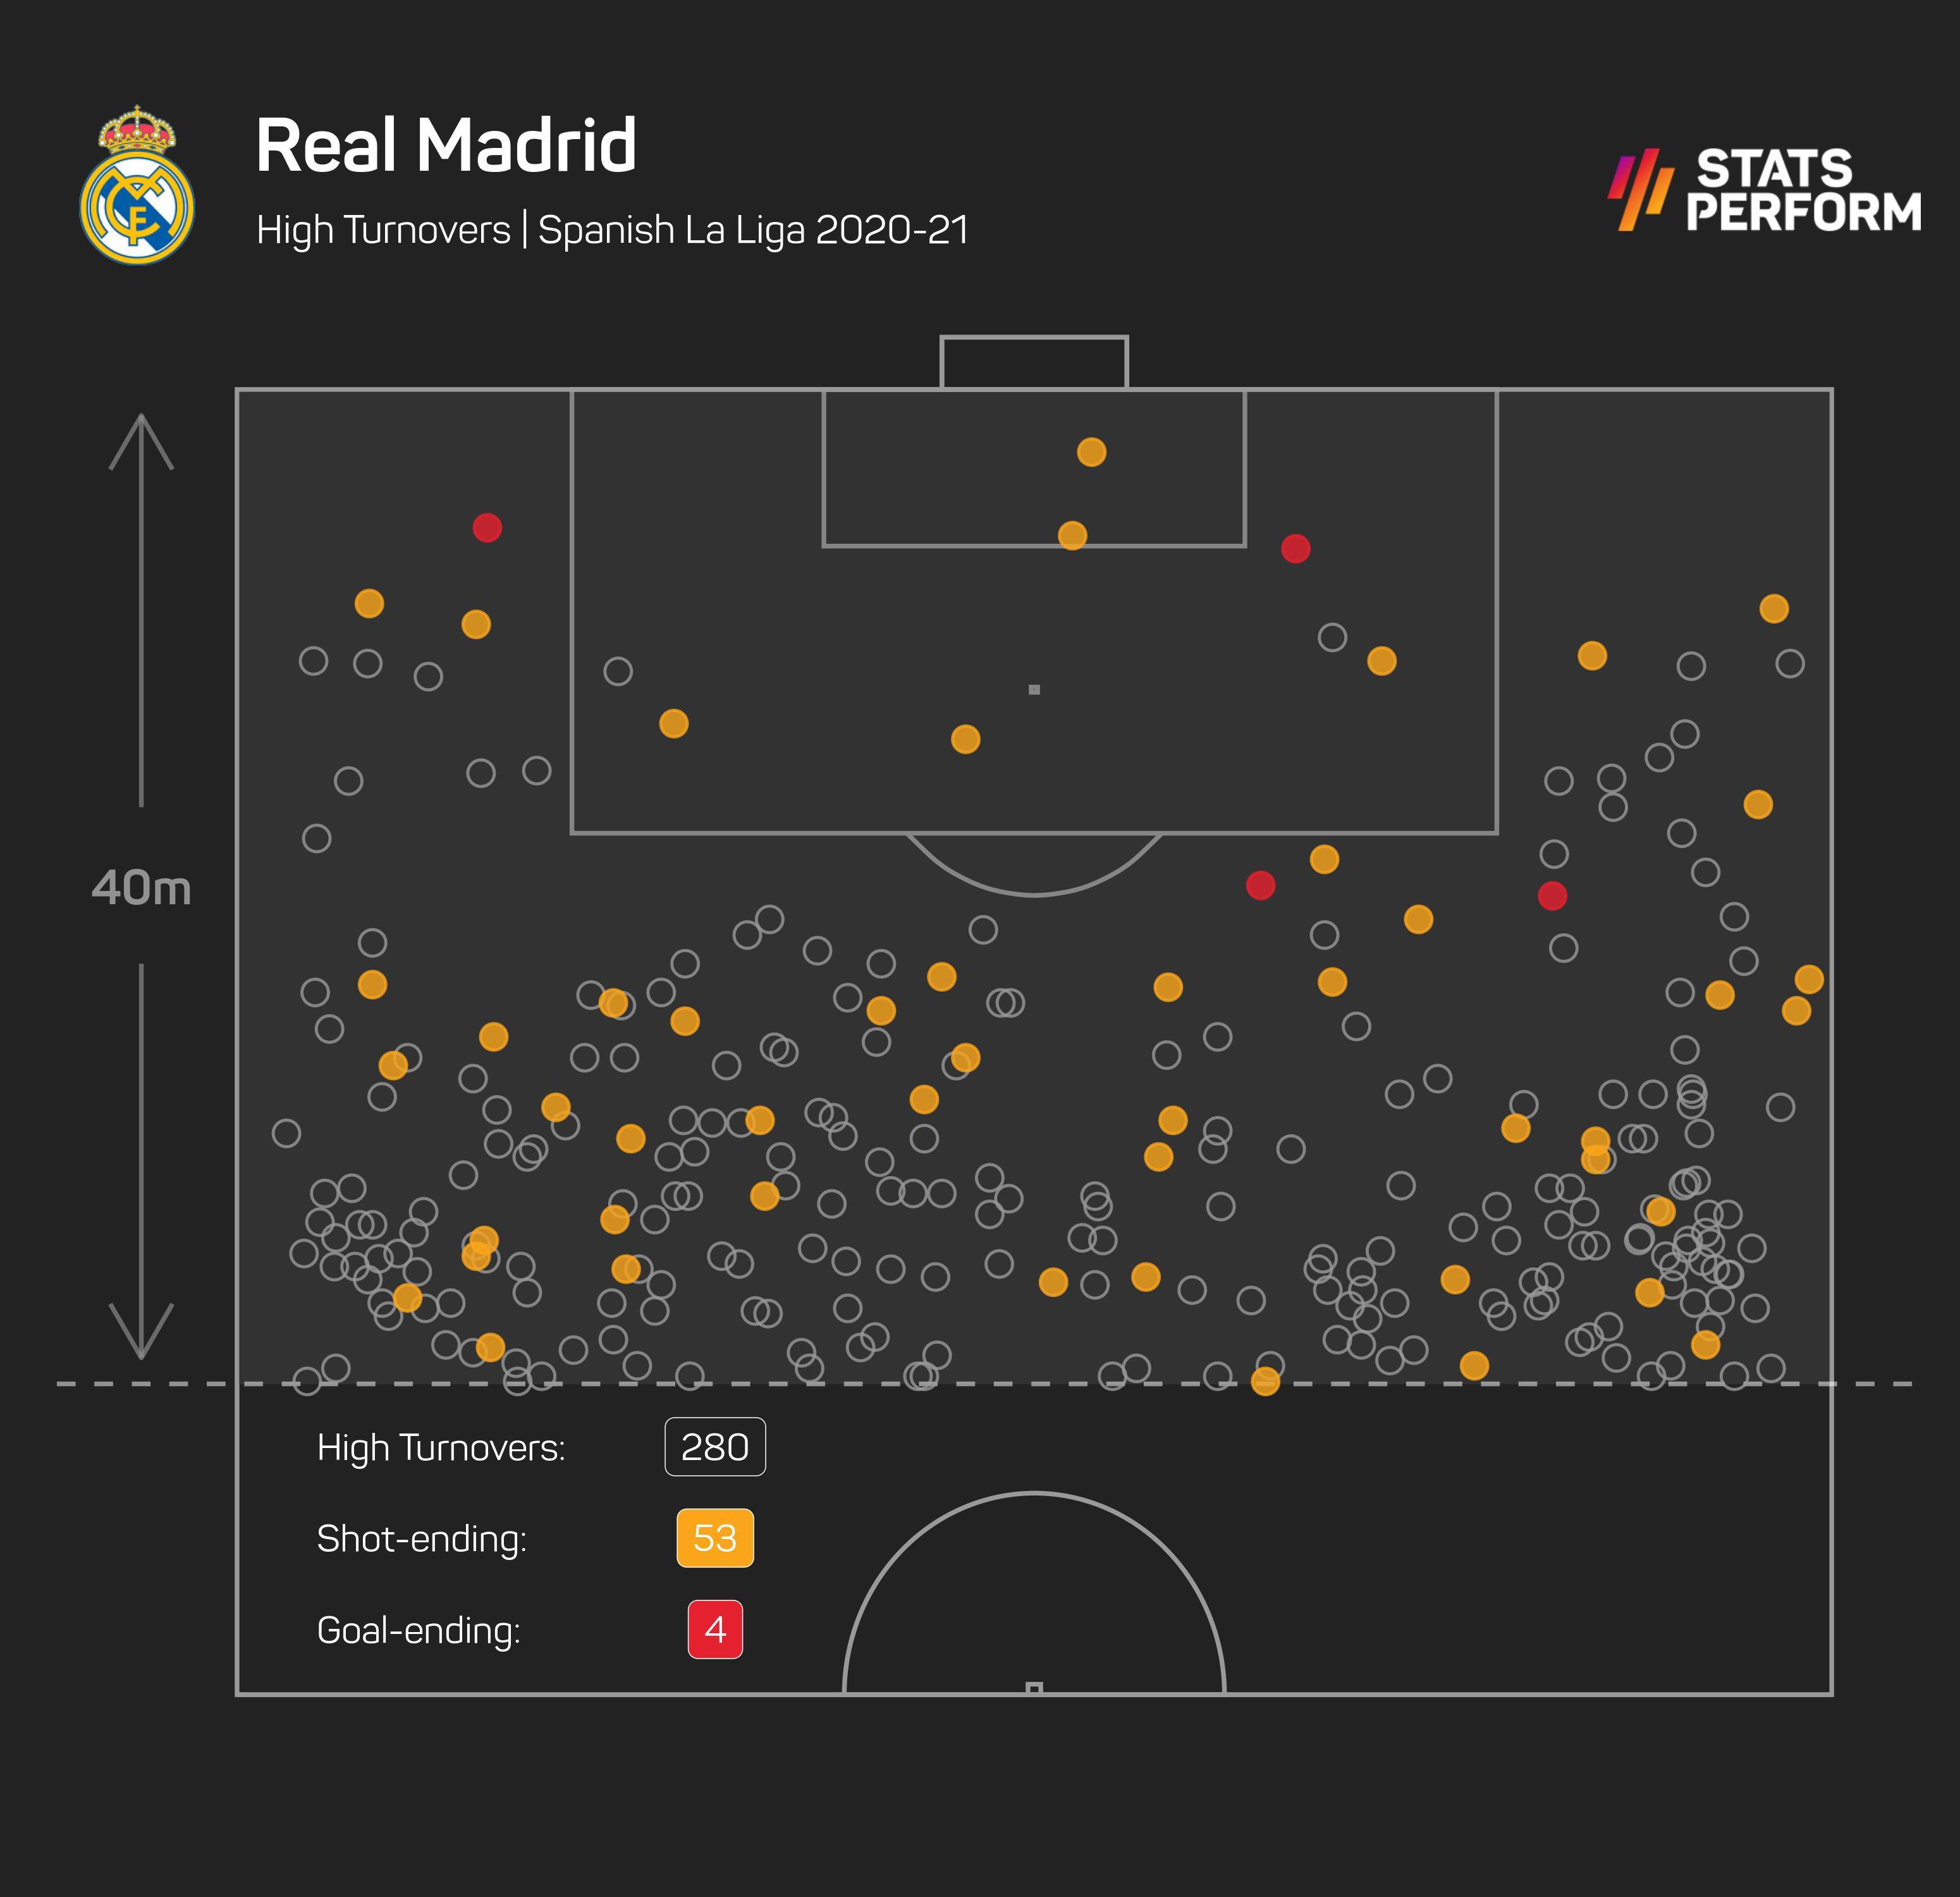 Real Madrid's high turnovers under Zinedine Zidane last season